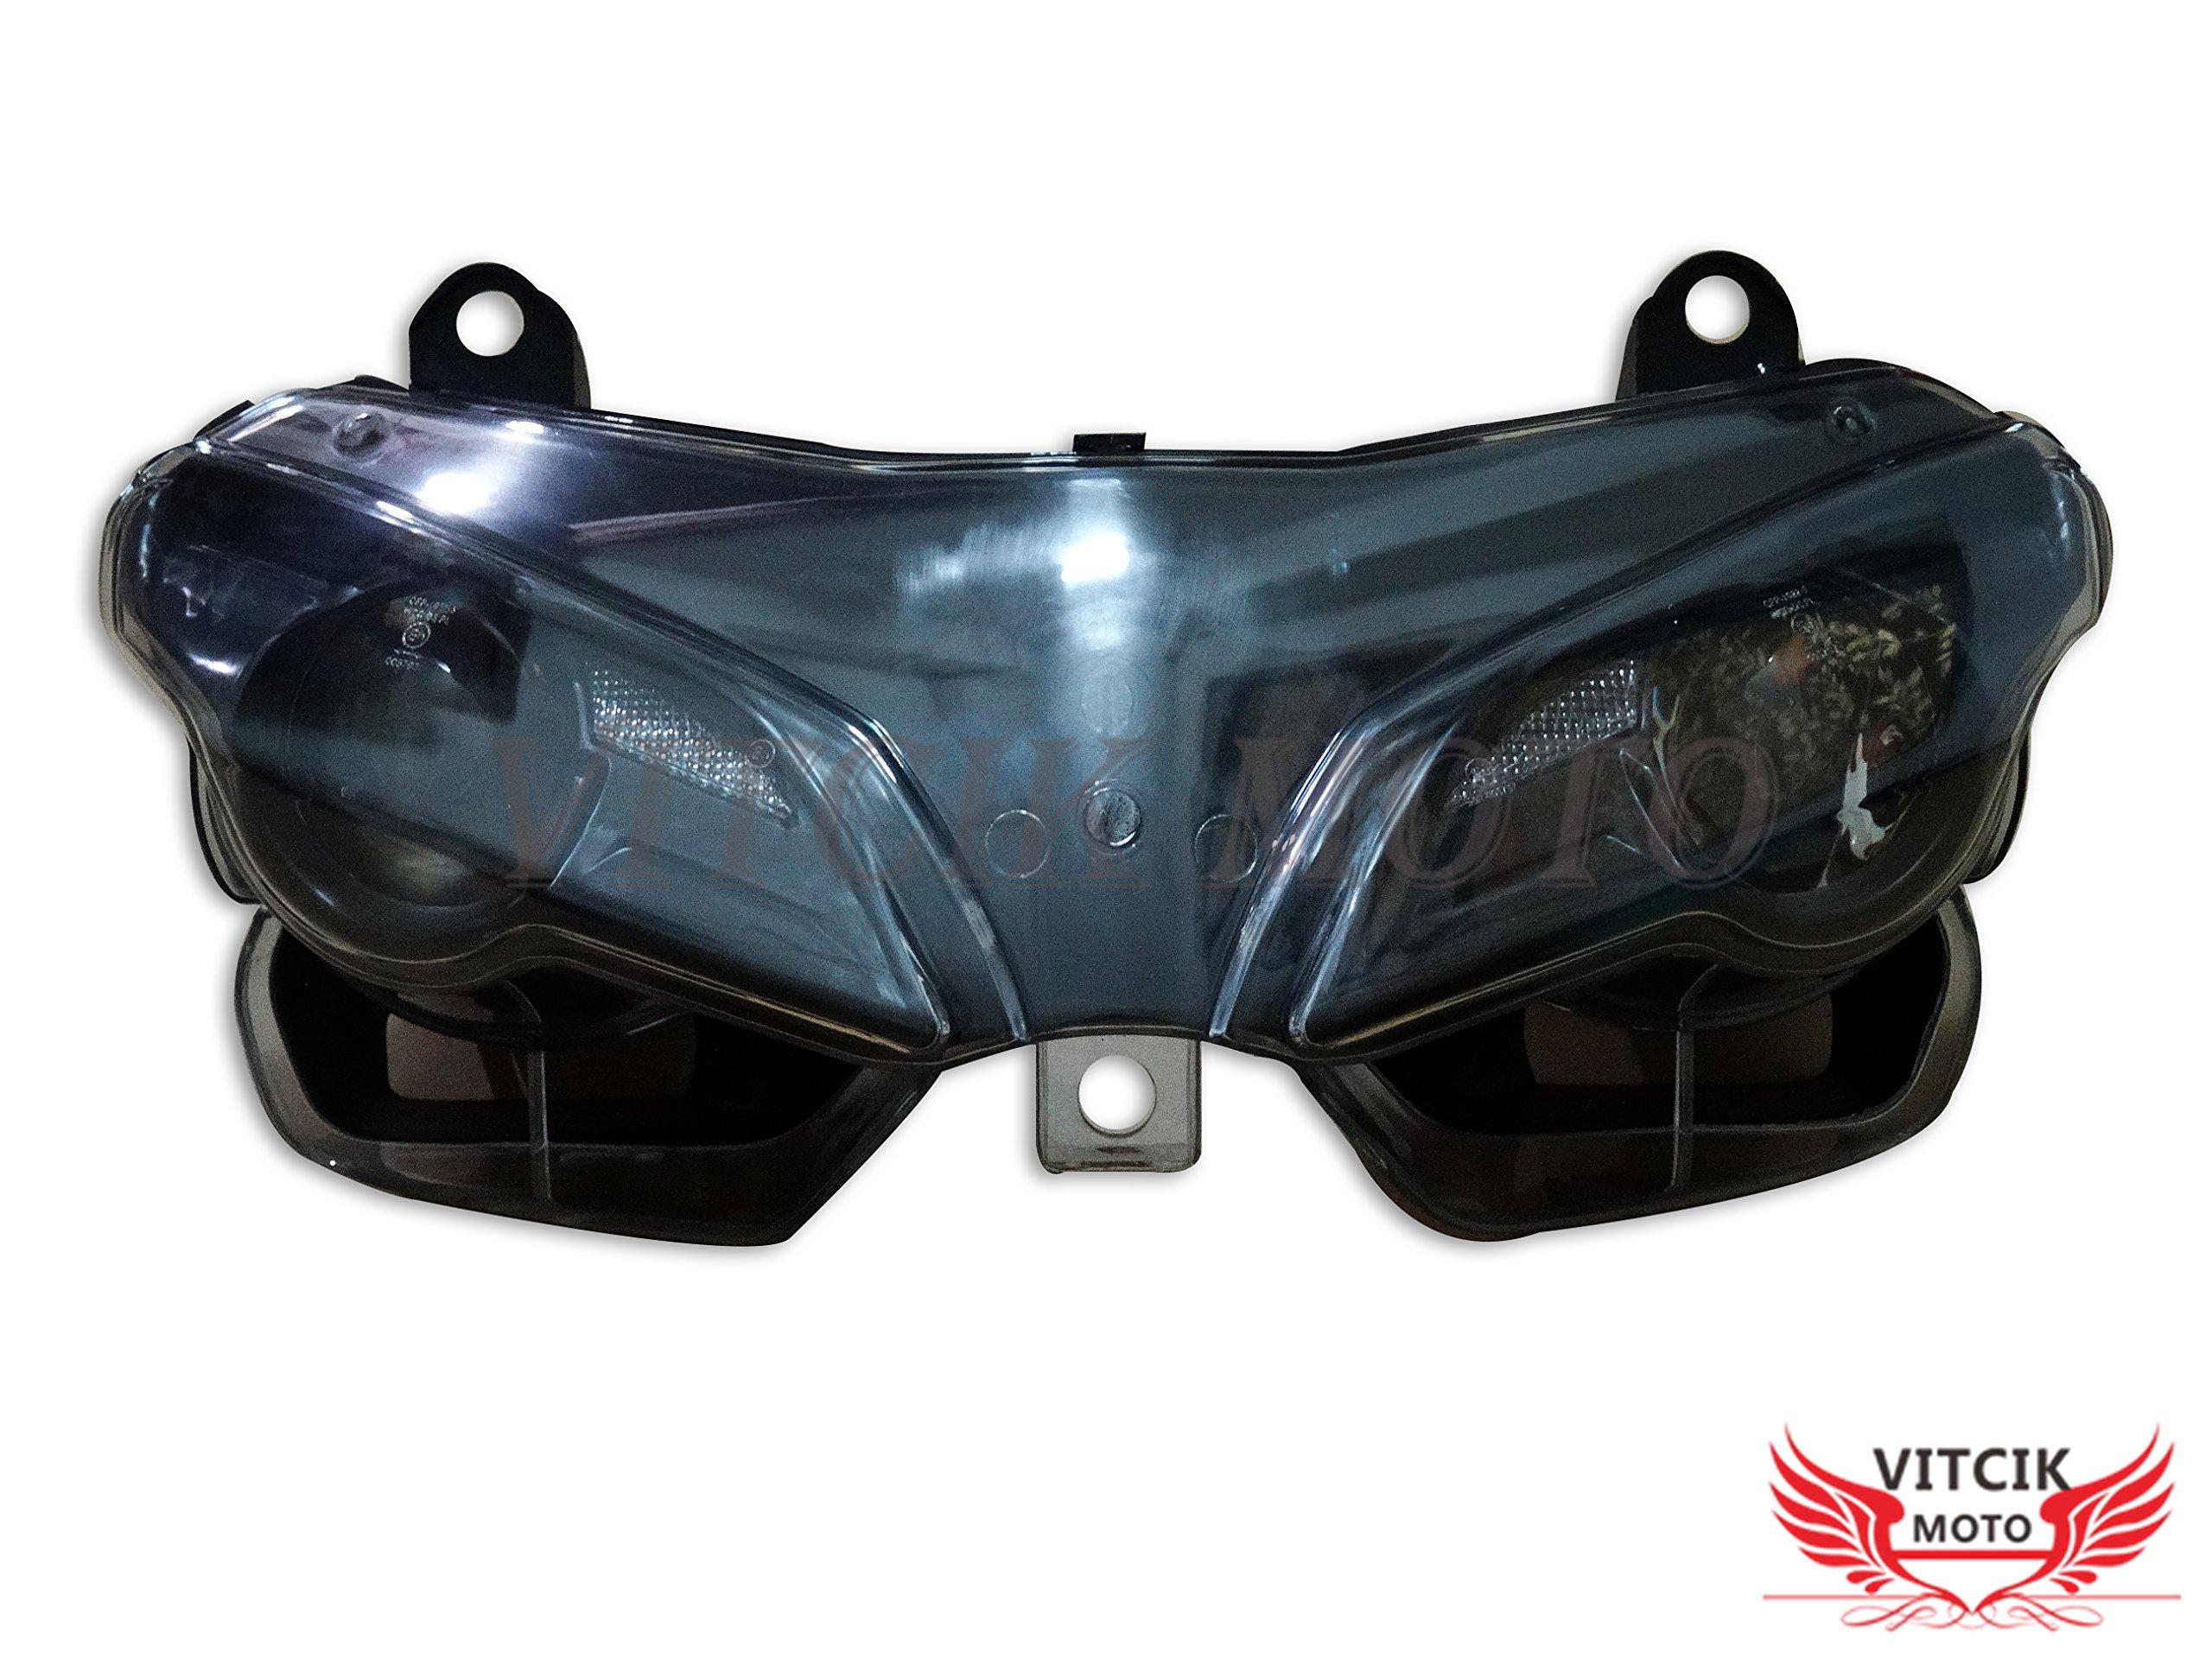 VITCIK Motorcycle Headlight Assembly for DUCATI 1098 848 2007 2008 2009 2010 2011 Head Light Lamp Assembly Kit (Black)